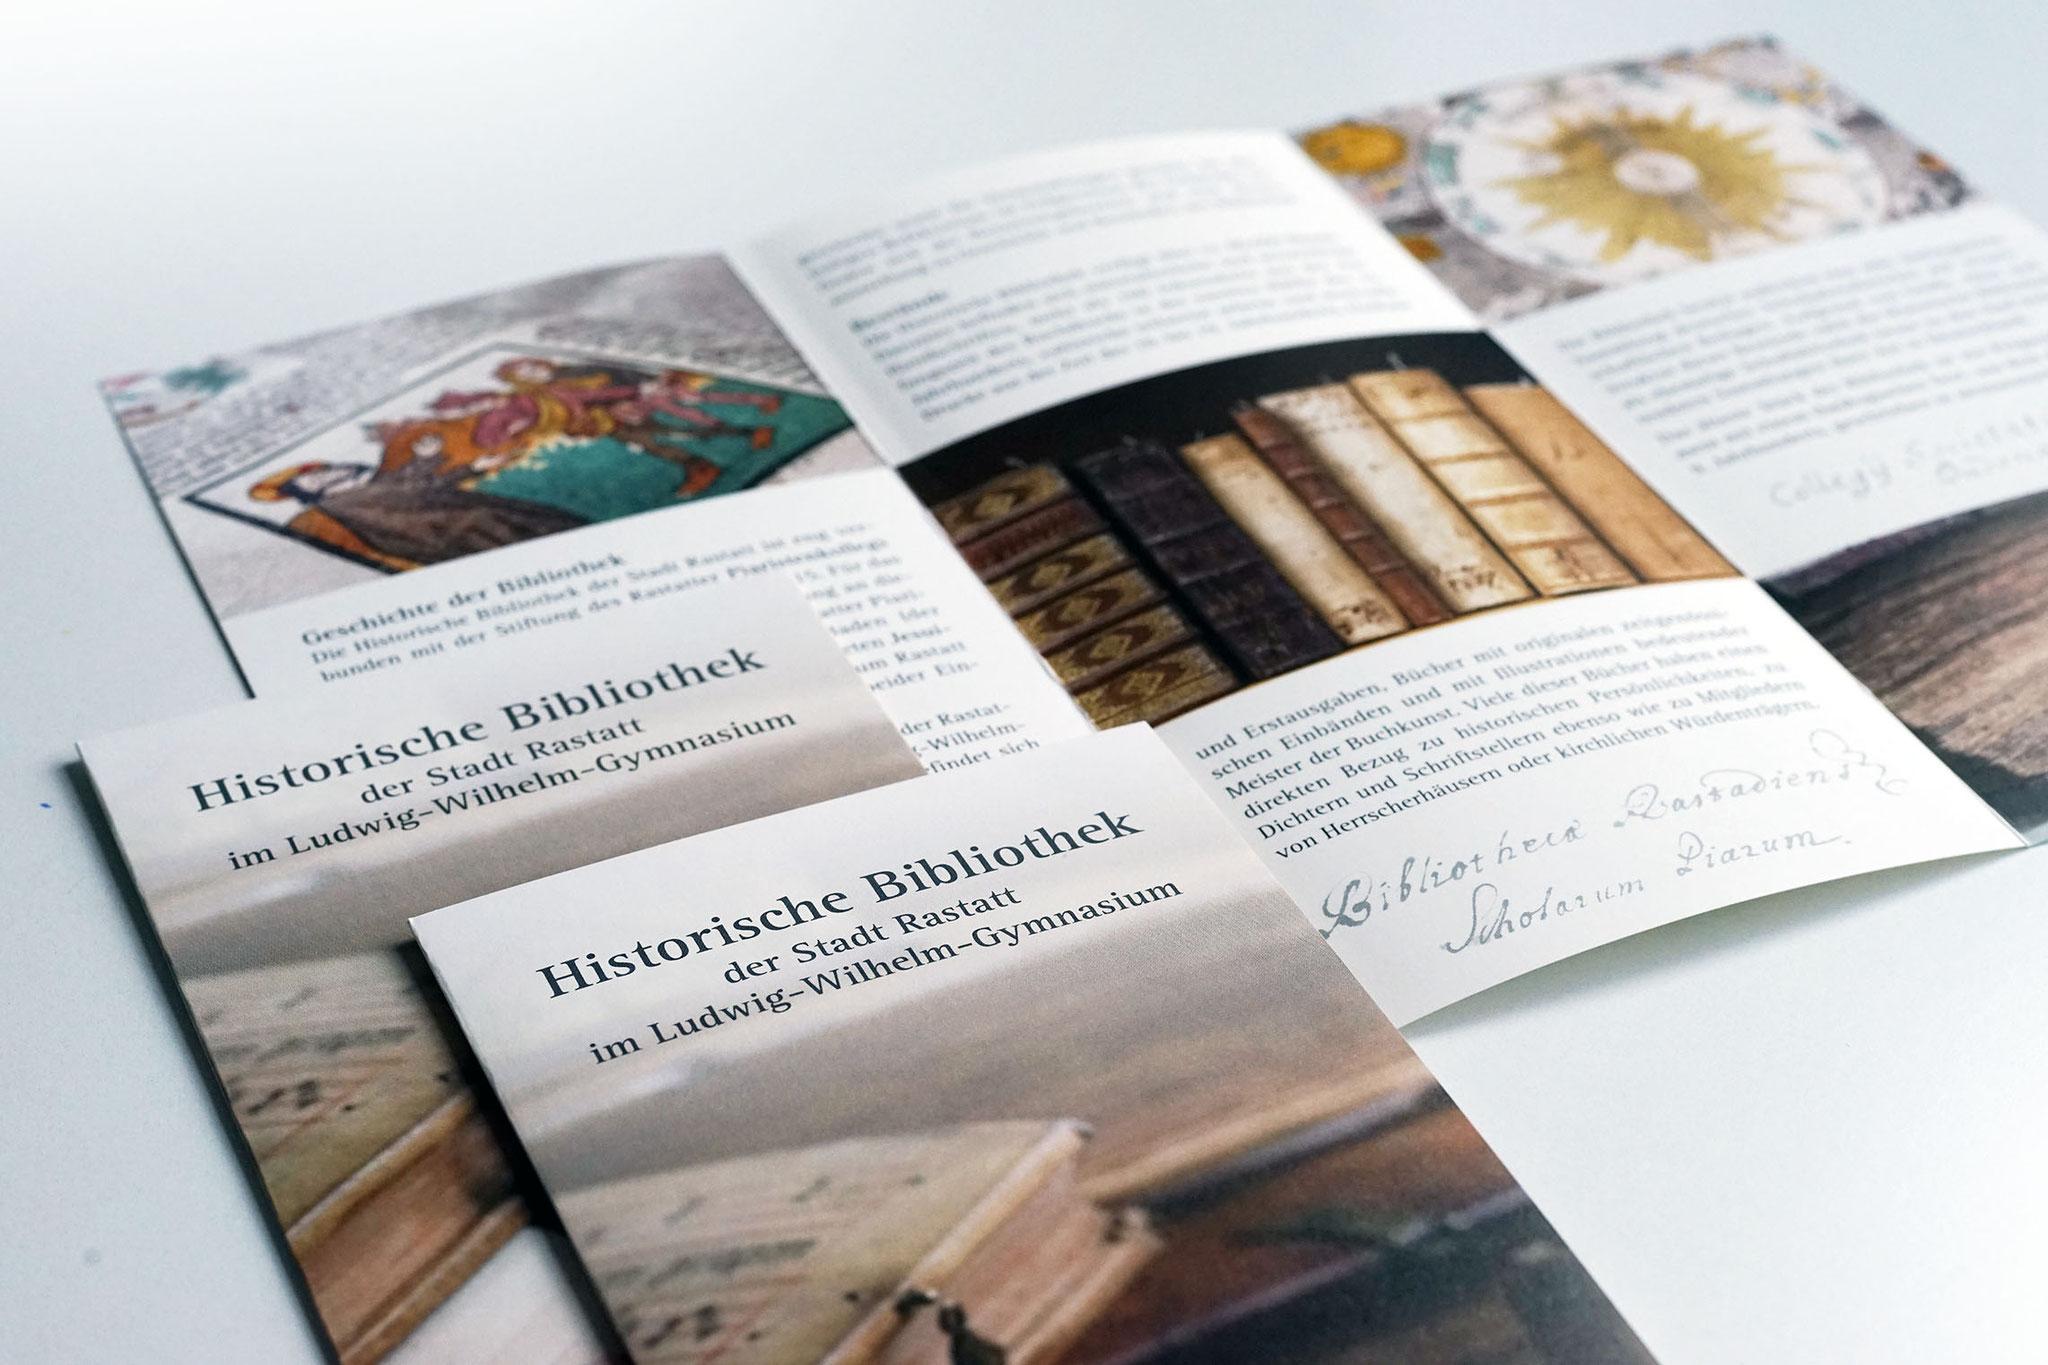 Infobroschüre Historische Bibliothek